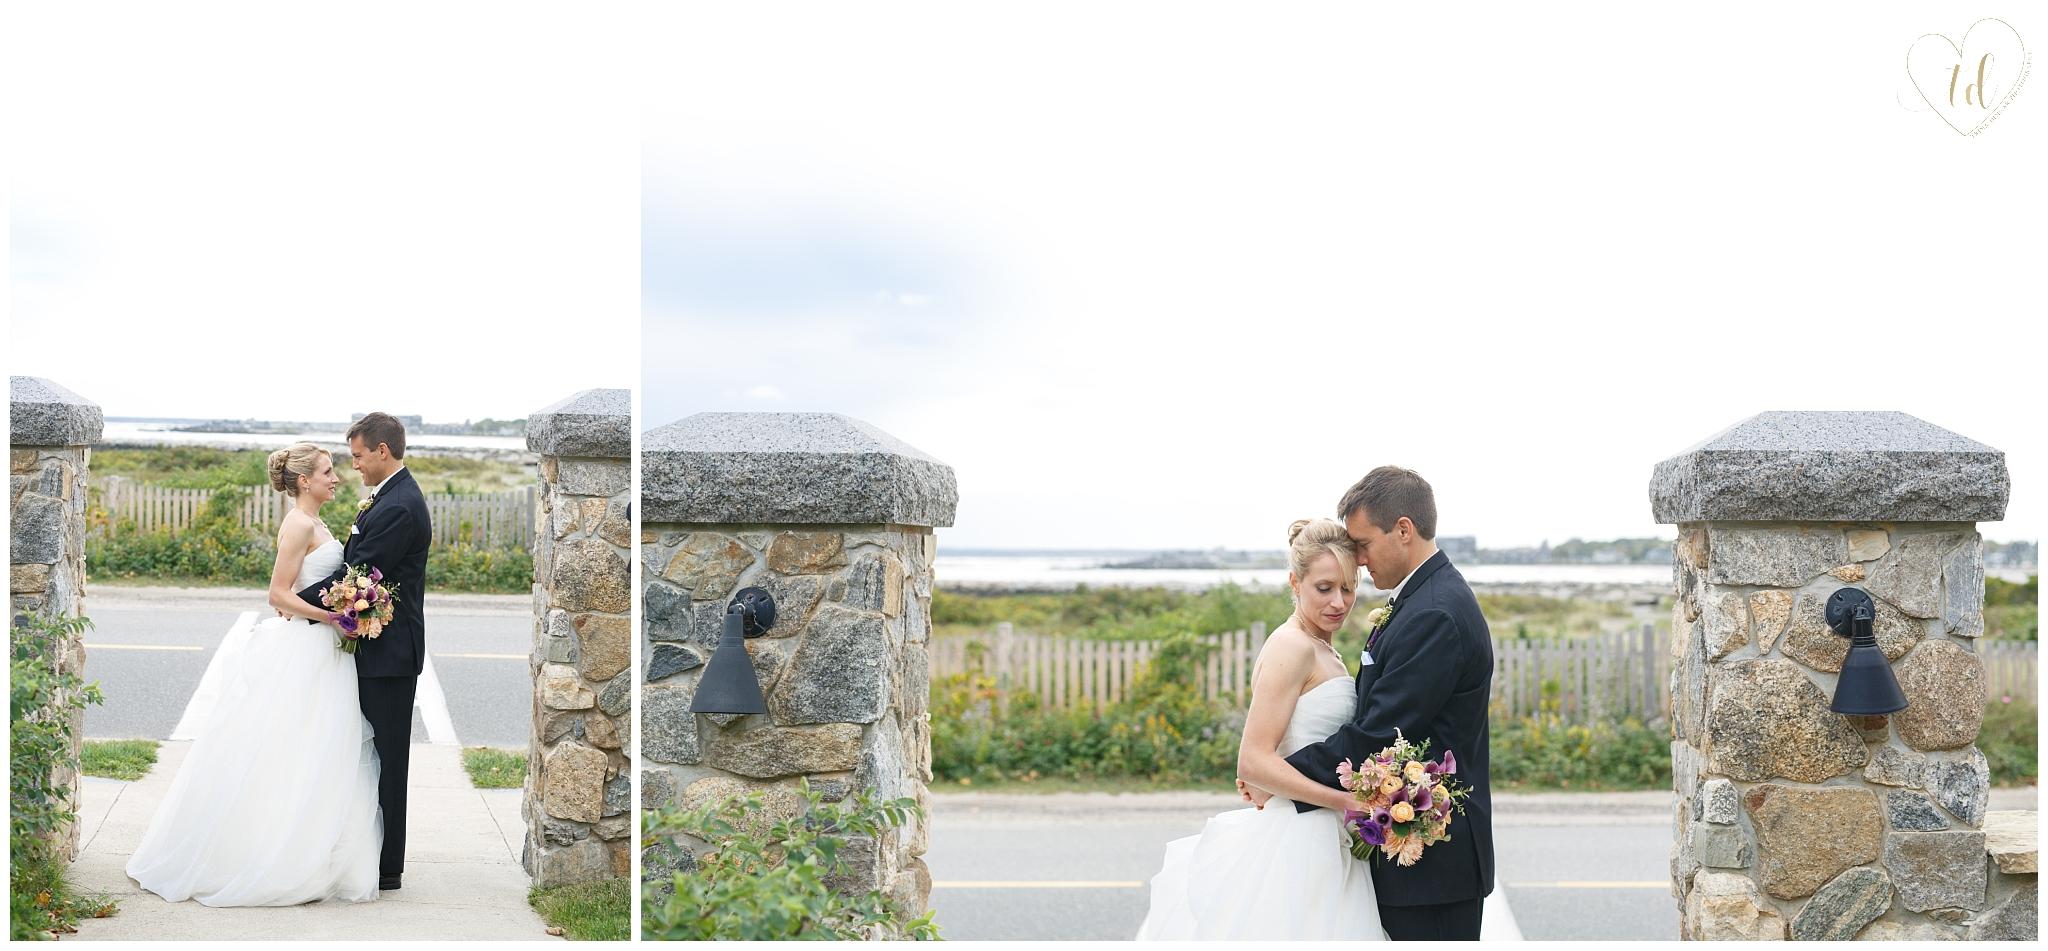 Wedding Photography Kennebunk Maine